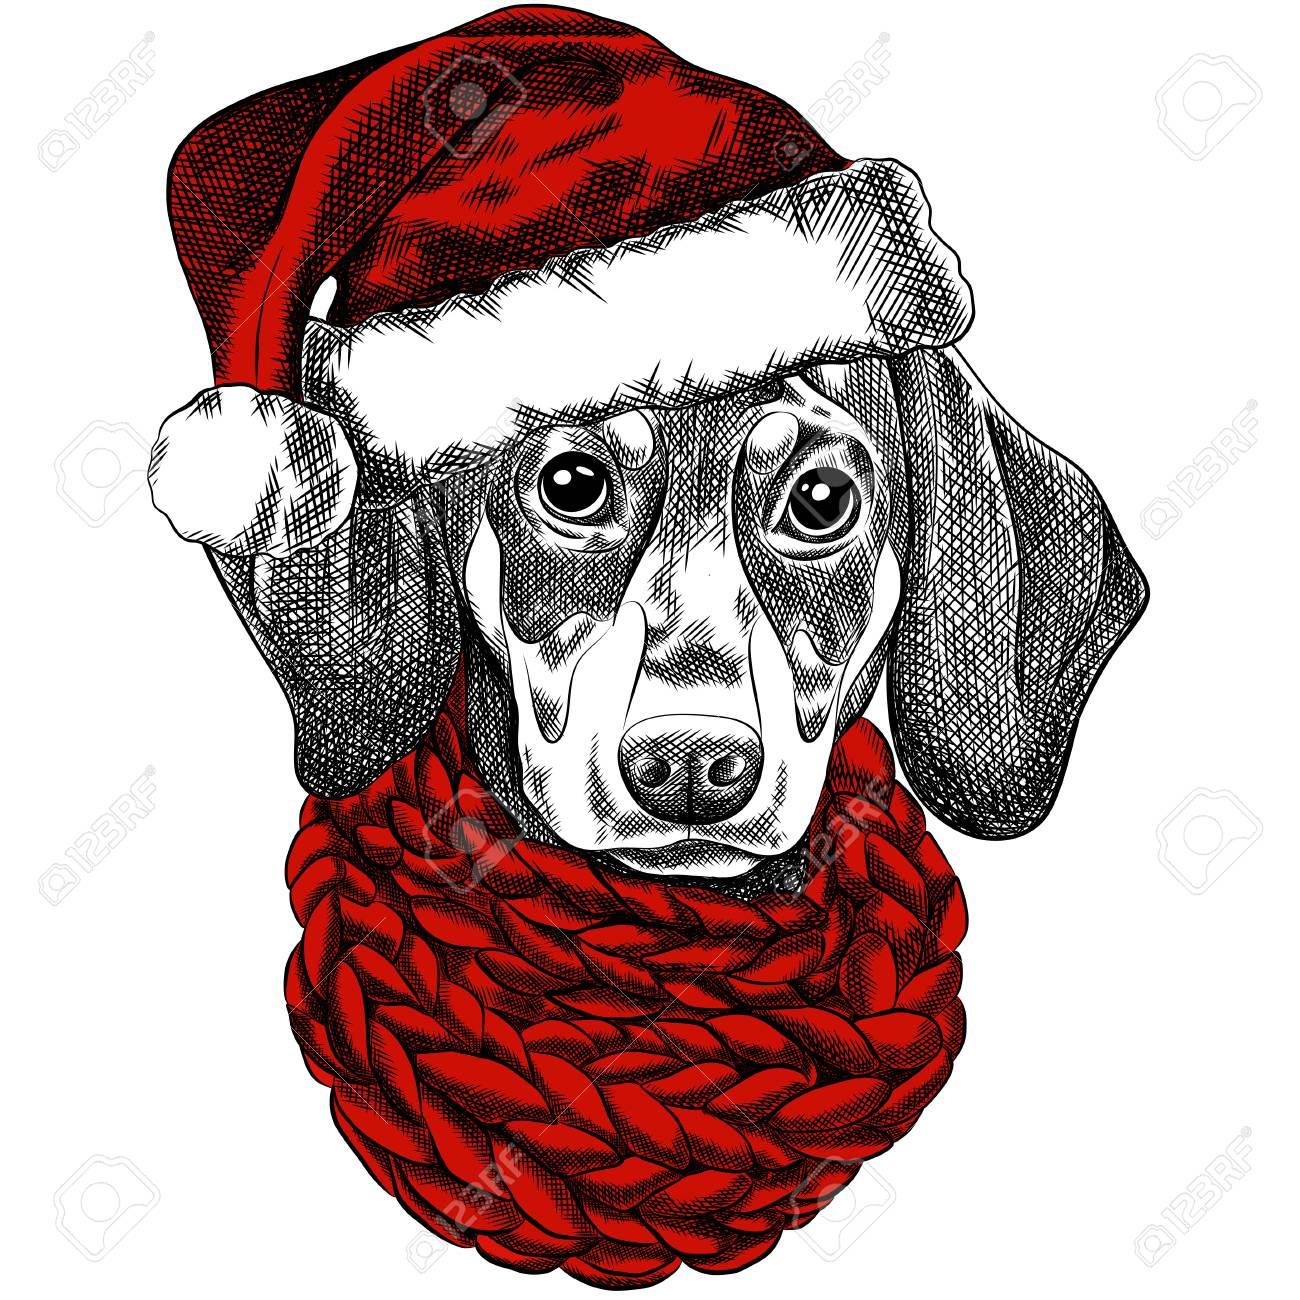 Vector Illustration Of A Dachshund Dog For A Christmas Card ...